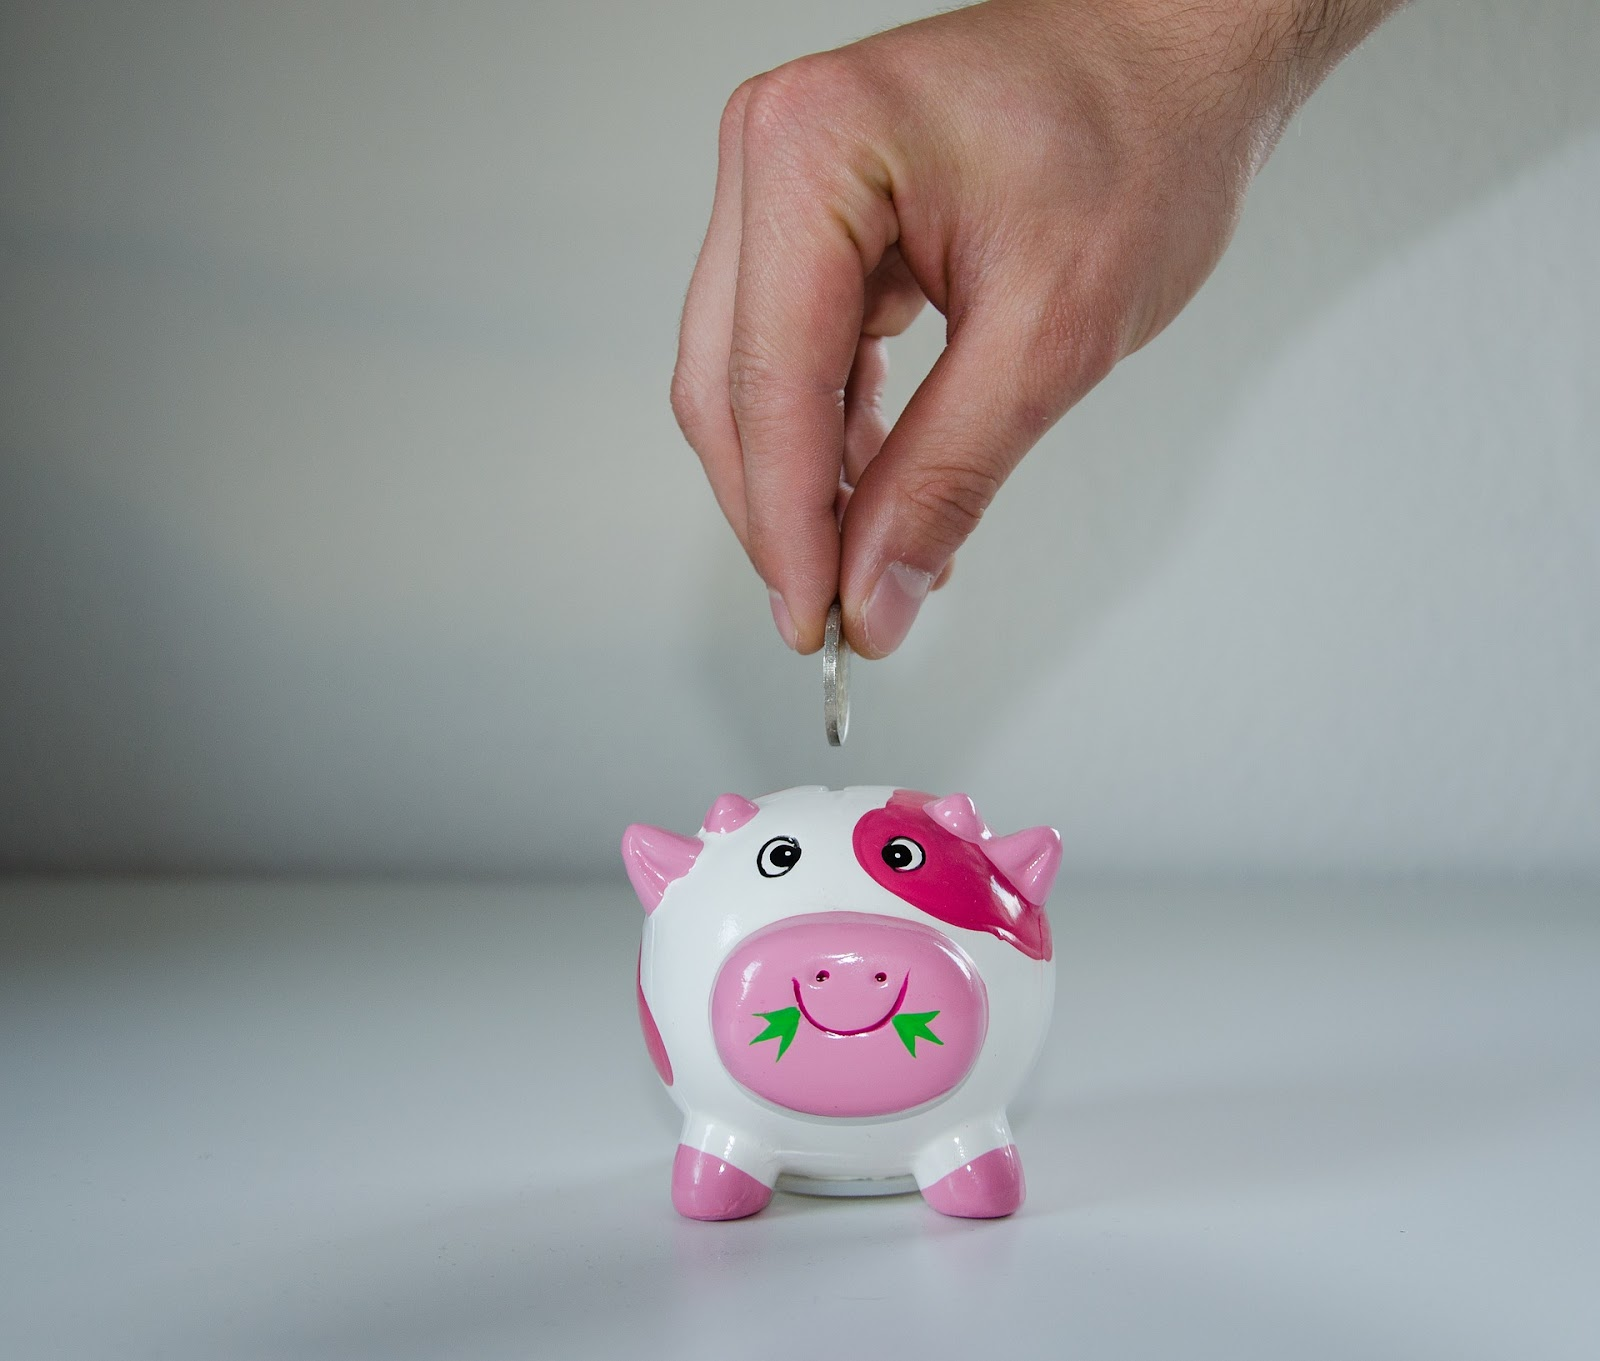 Inexpensive to start blogging